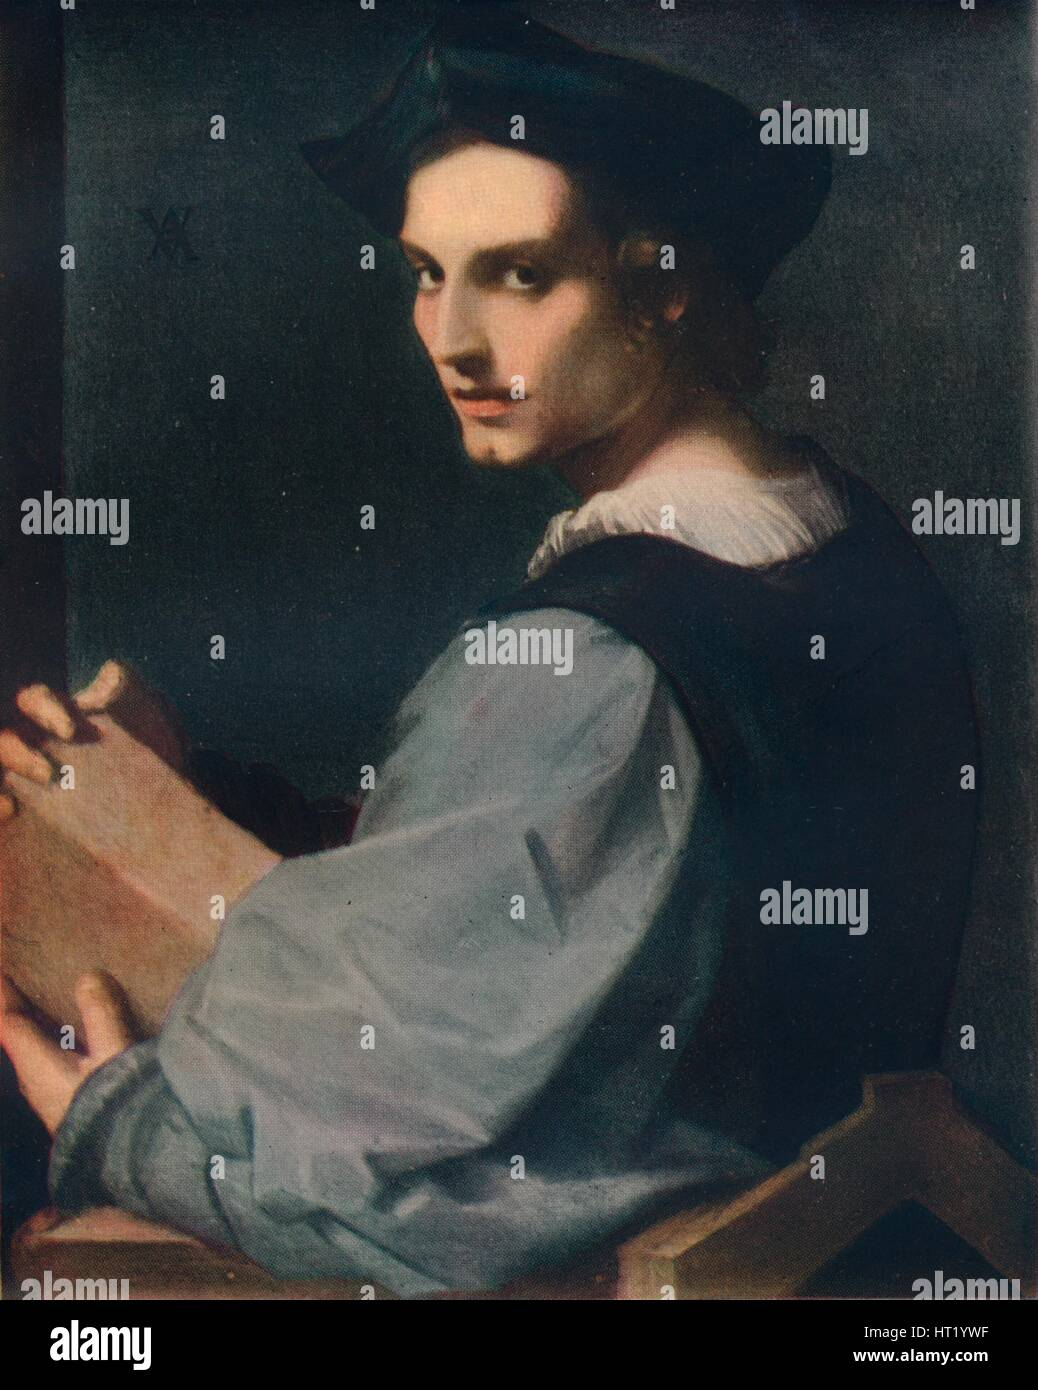 Portrait of a Young Man, c1517, (1911). Artist: Andrea del Sarto - Stock Image